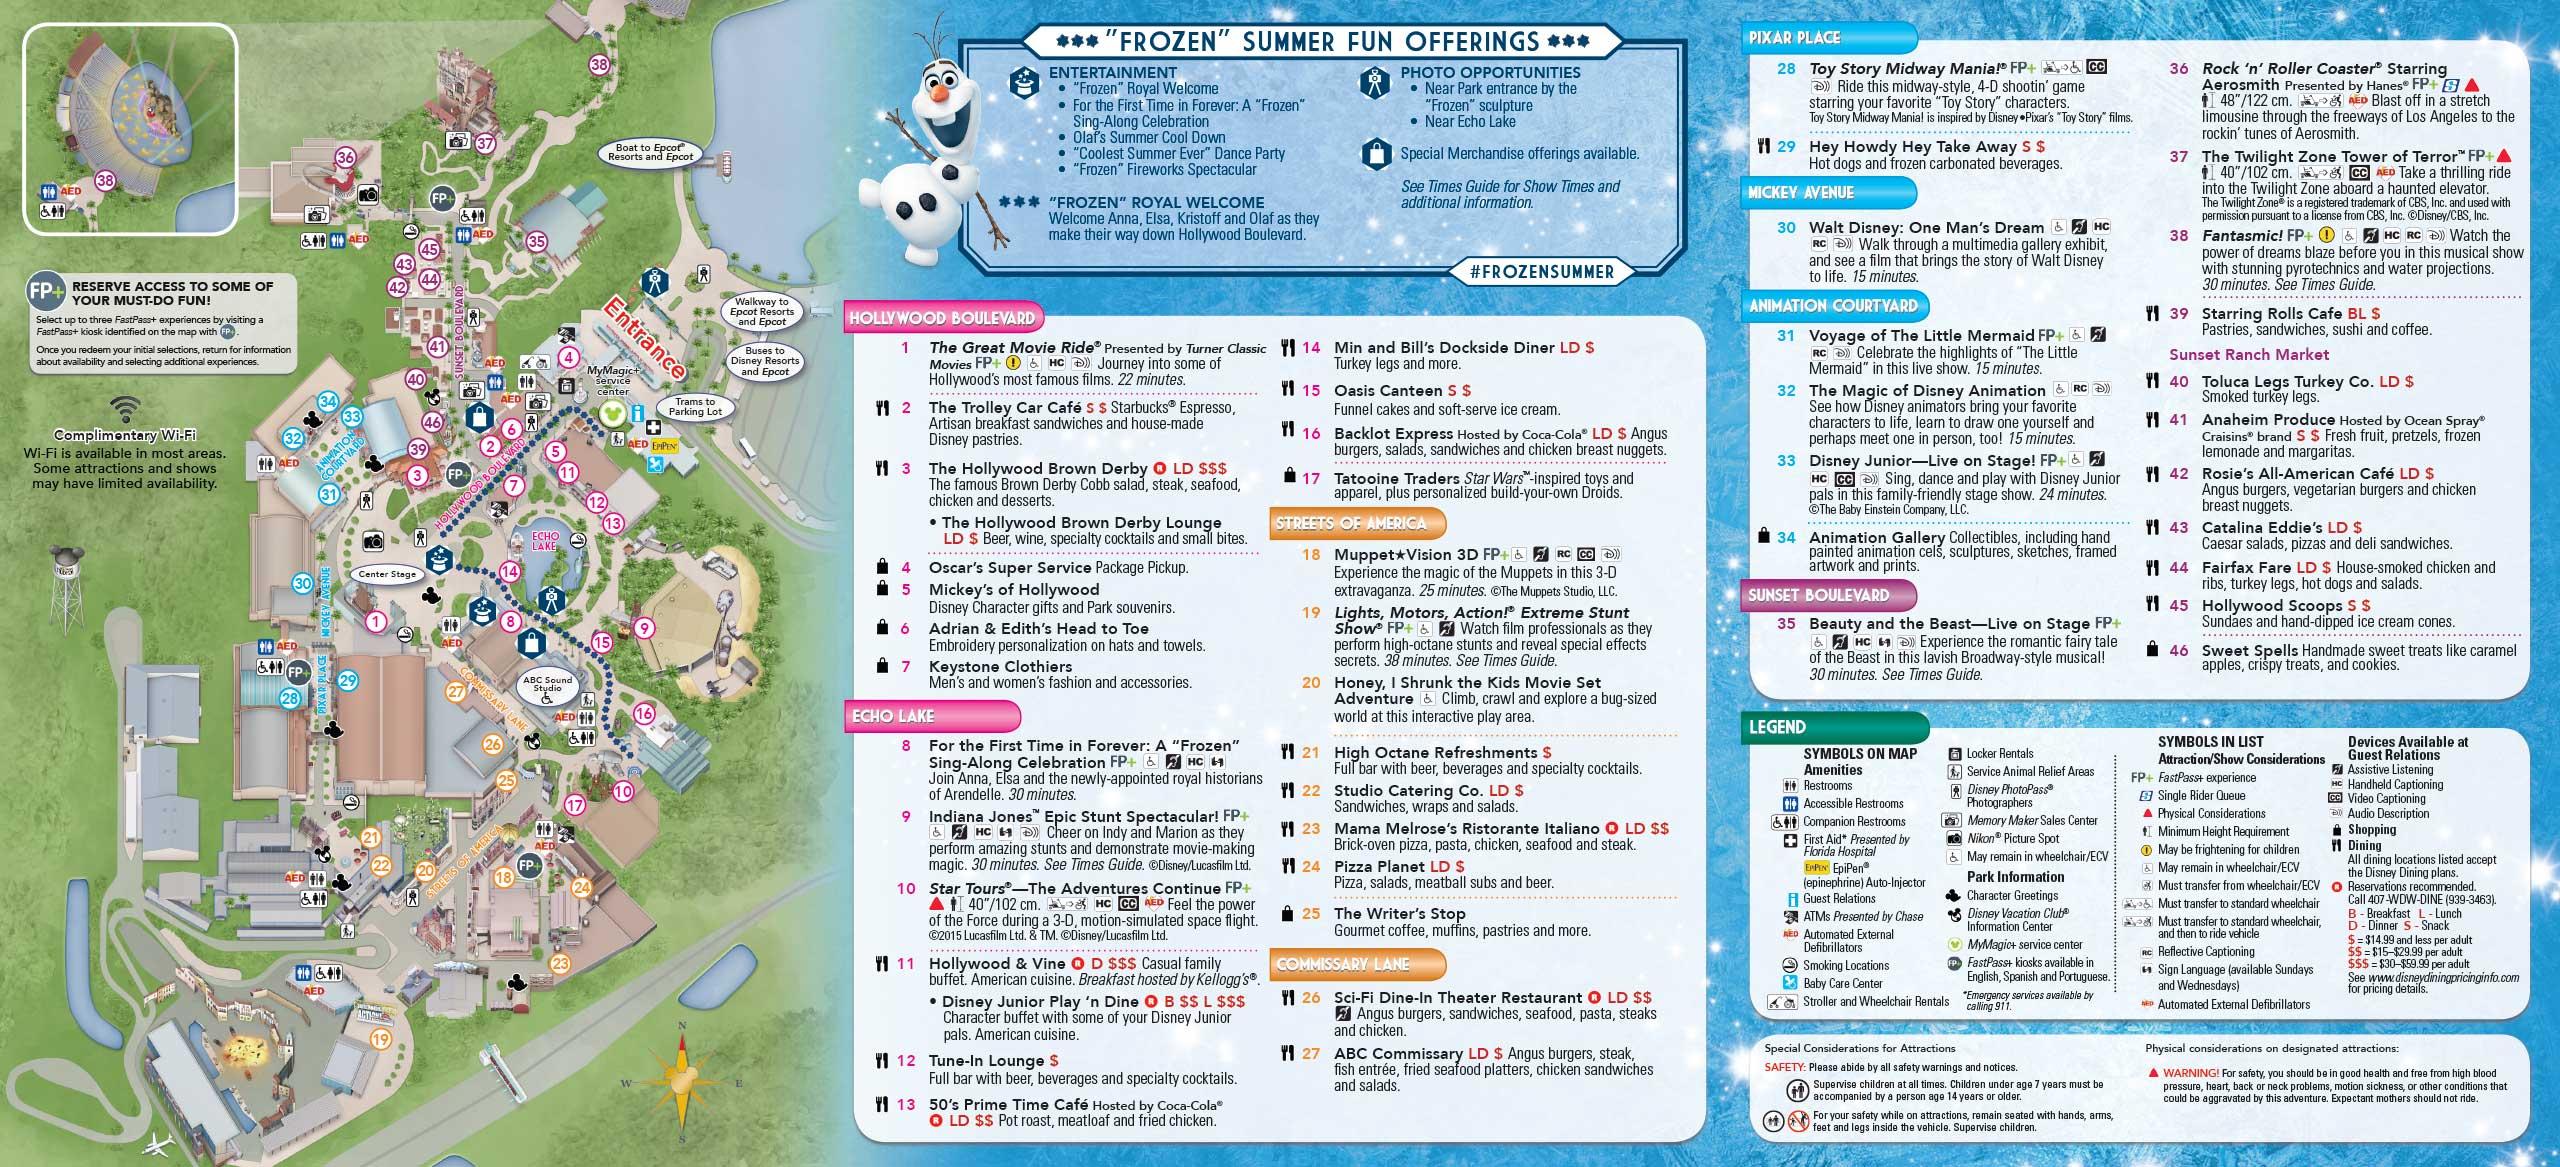 May 2015 walt disney world resort park maps photo 4 of 14 may 2015 walt disney world resort park maps gumiabroncs Gallery